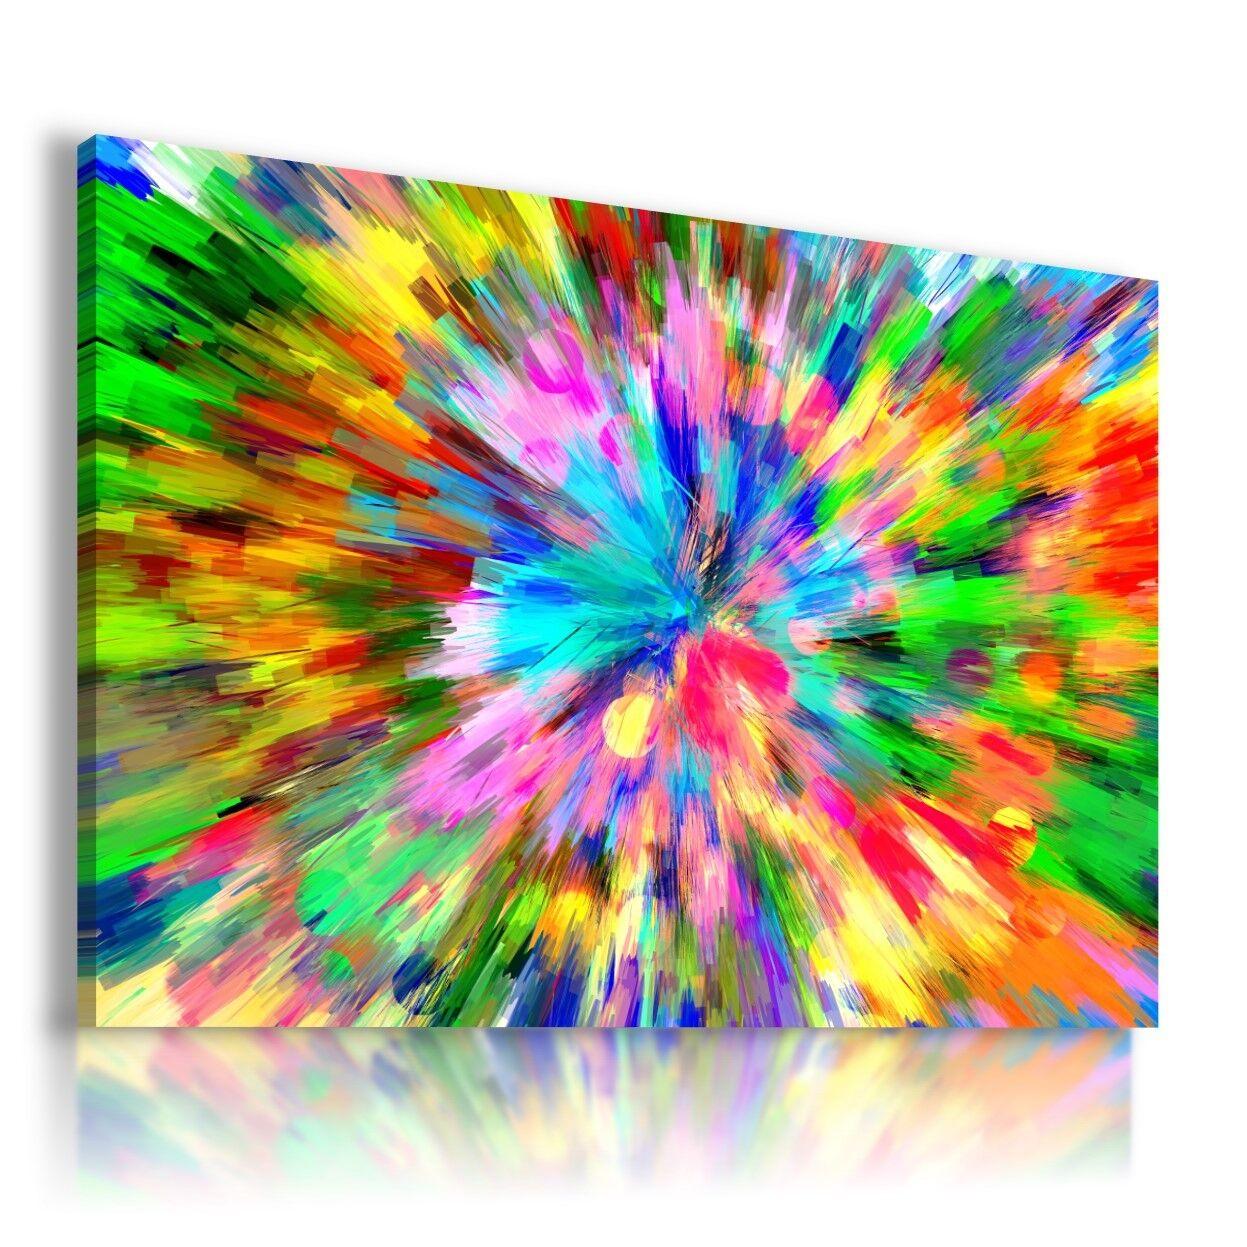 BOMBA Coloreeati Dipinto Astratto stampa su tela Wall Art Picture AB884 mataga.